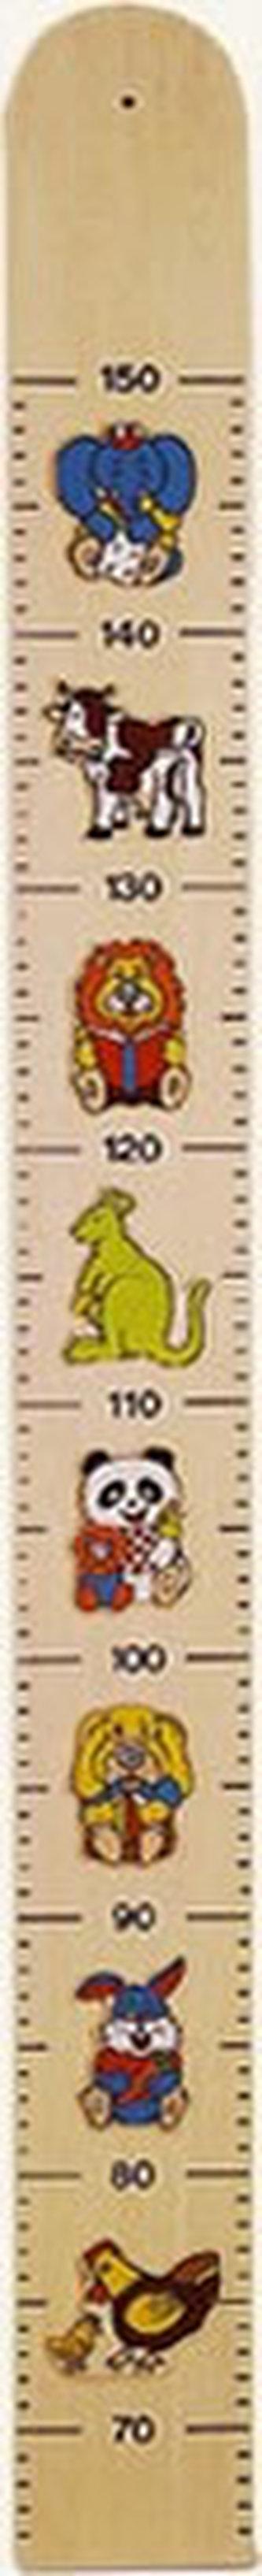 Závěsný metr - exotická zvířata